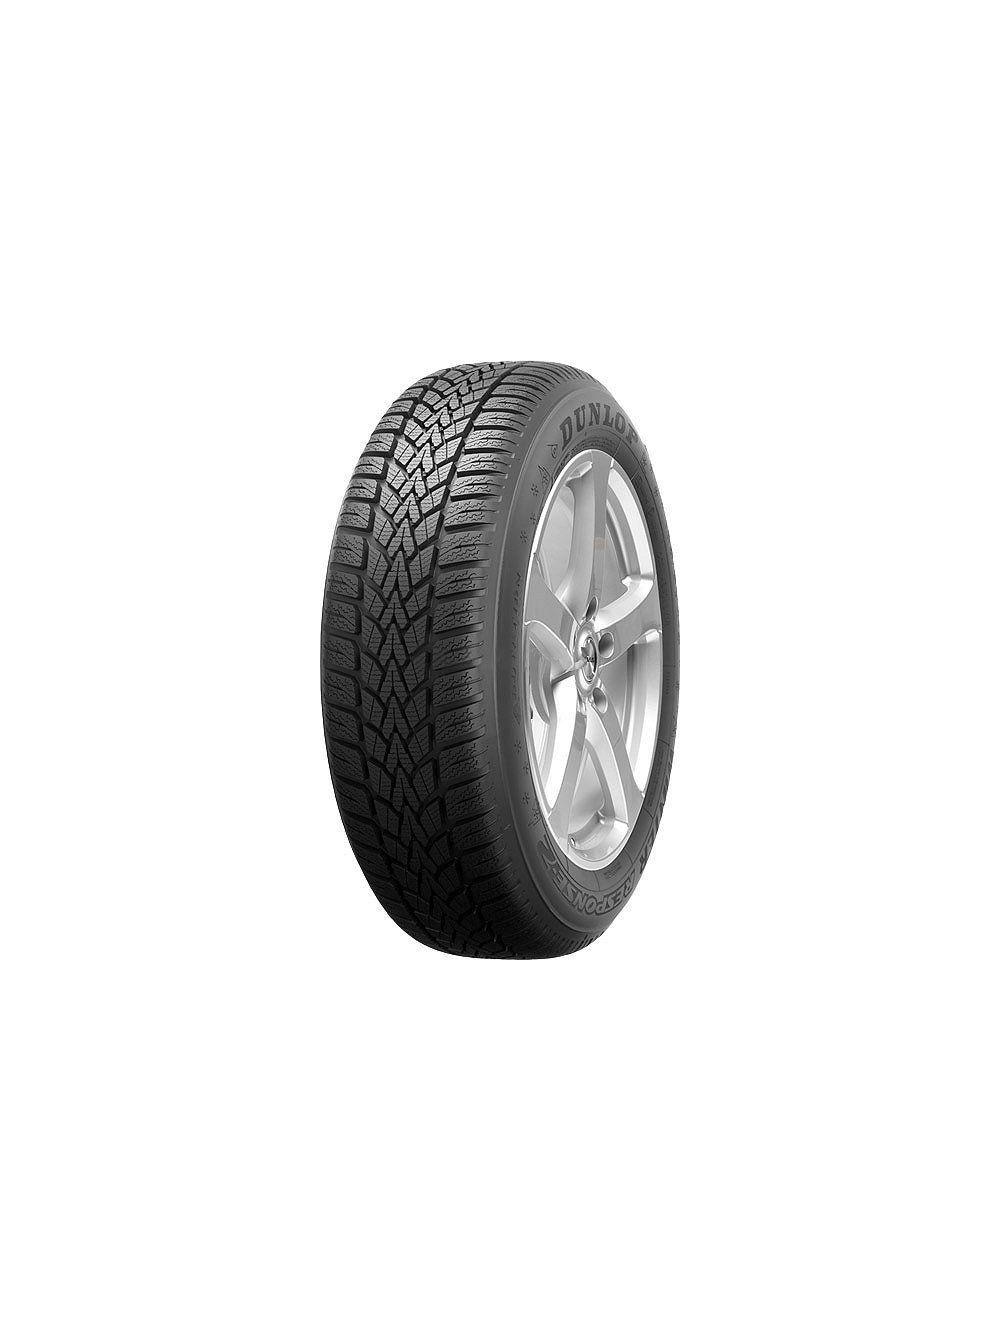 Dunlop 175/65R14 T SP WinterResponse 2 Téli gumi